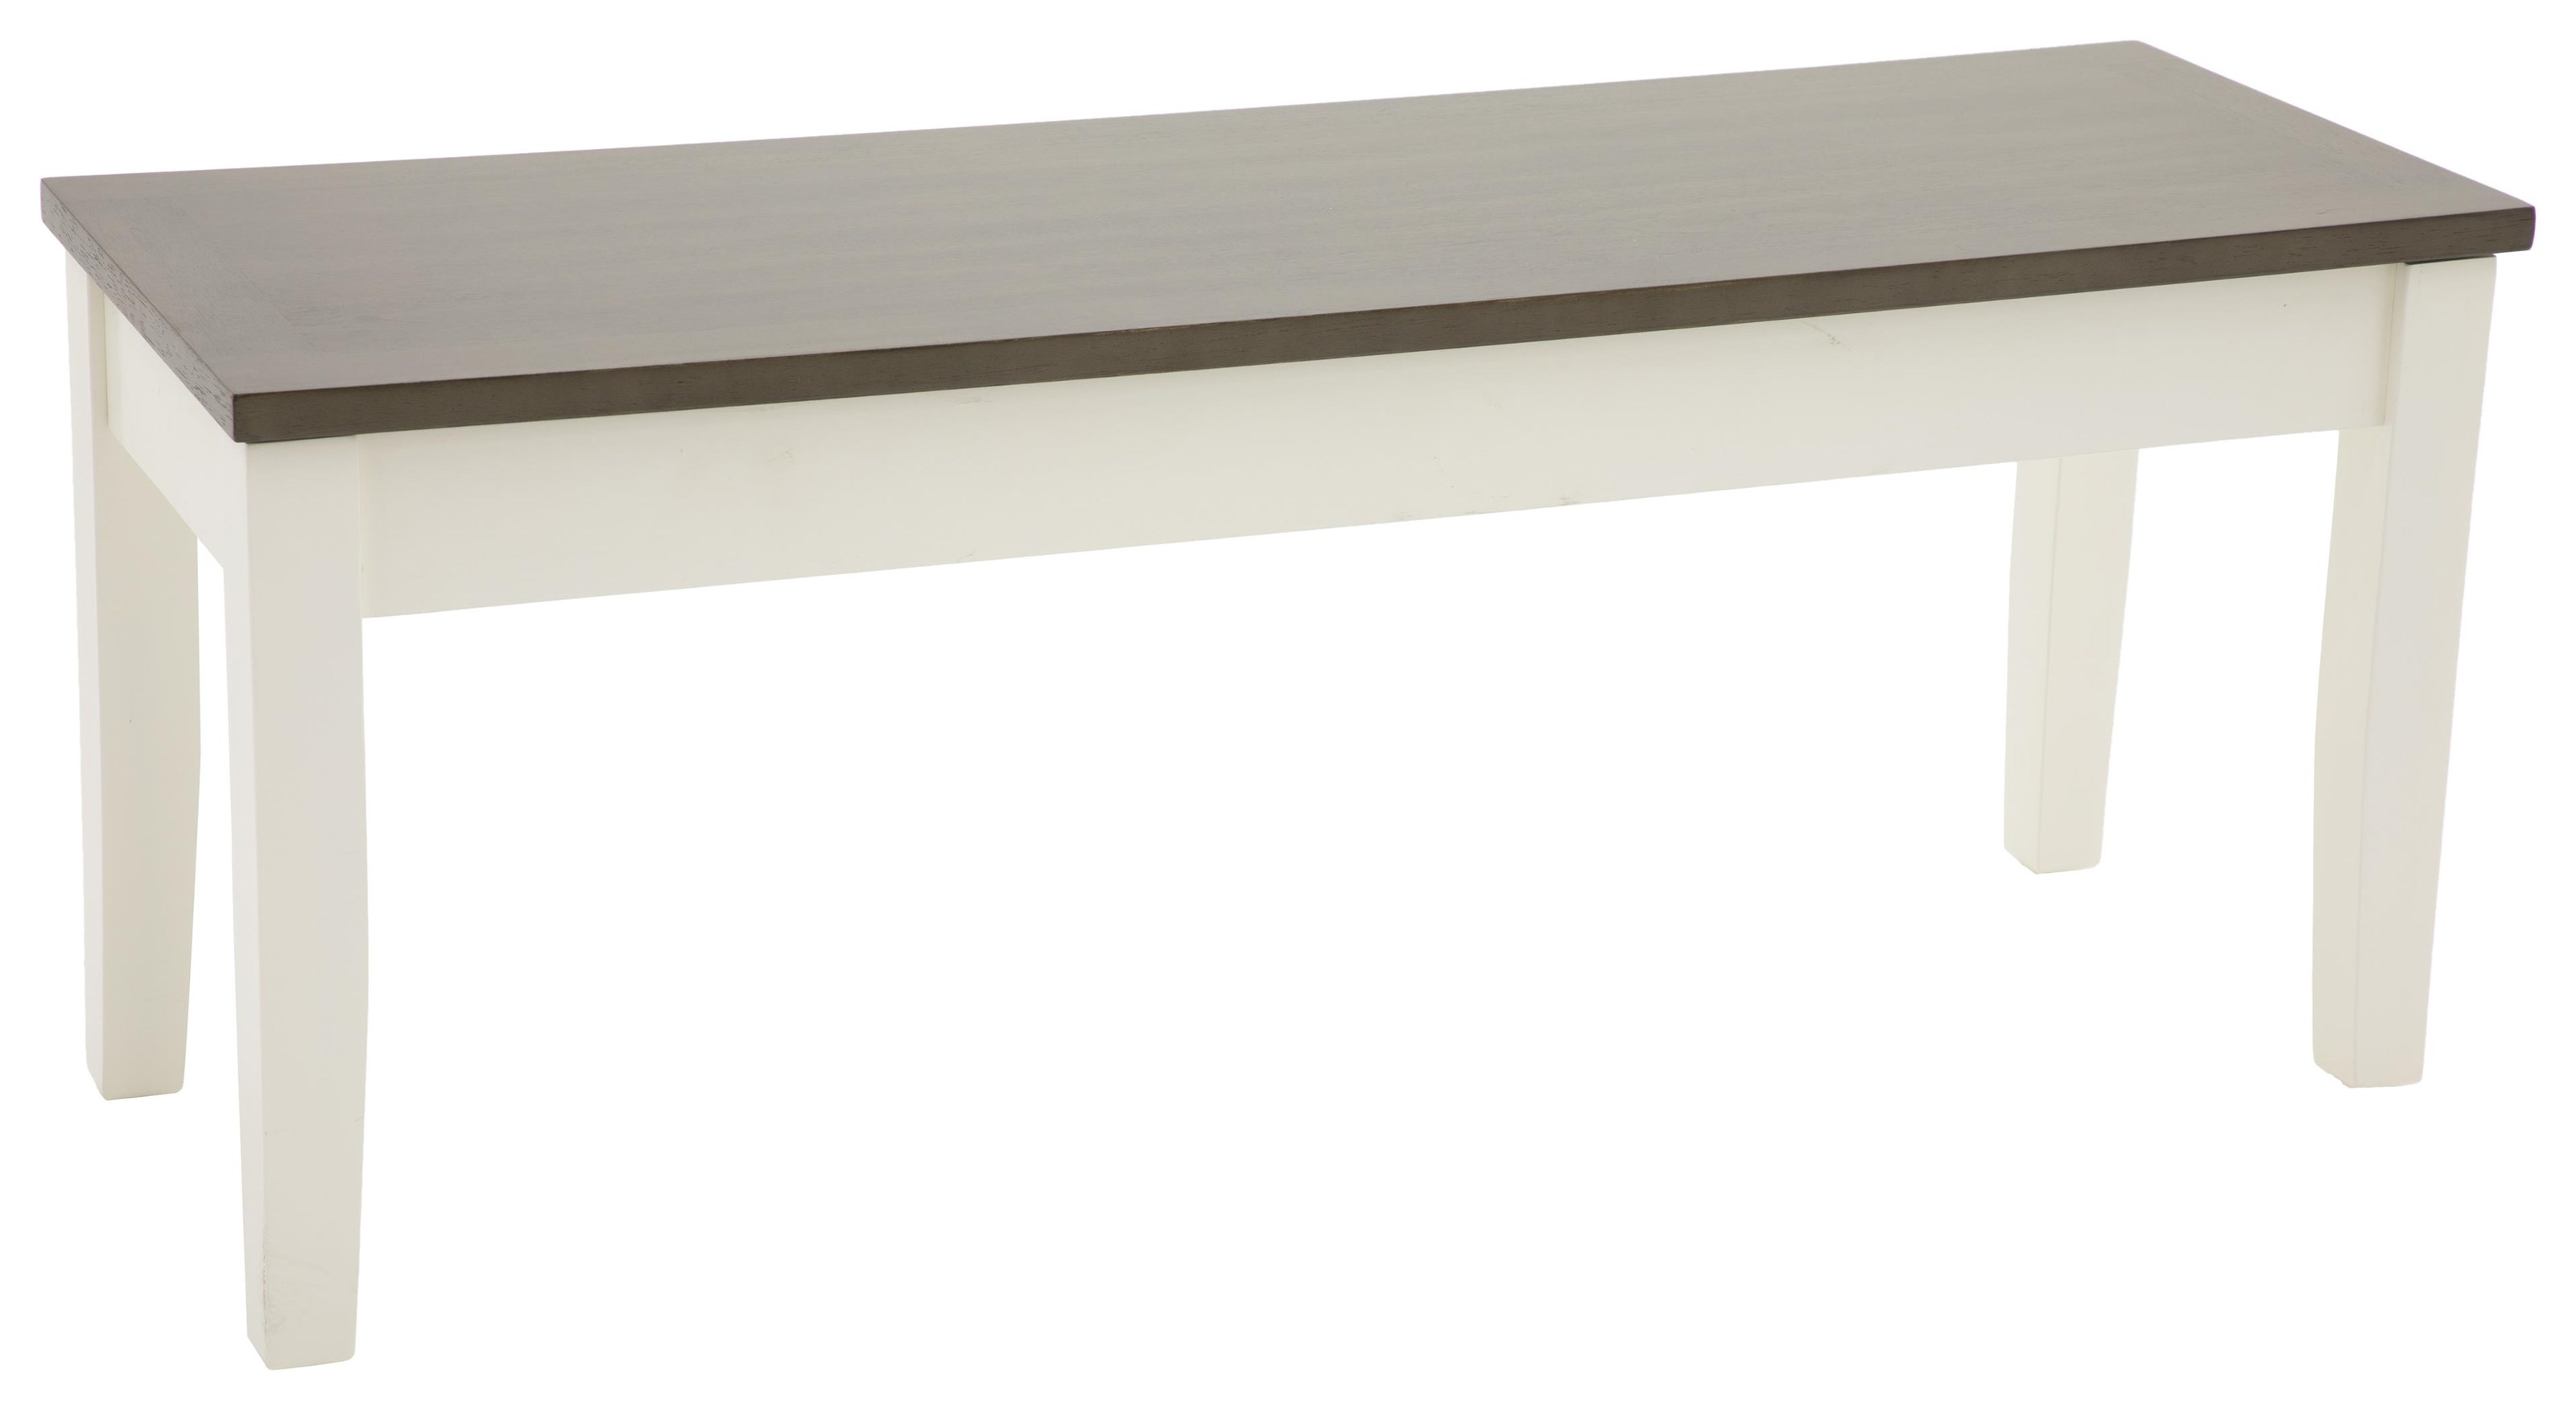 Carey White Carey Standard Height Storage Bench by HH at Walker's Furniture